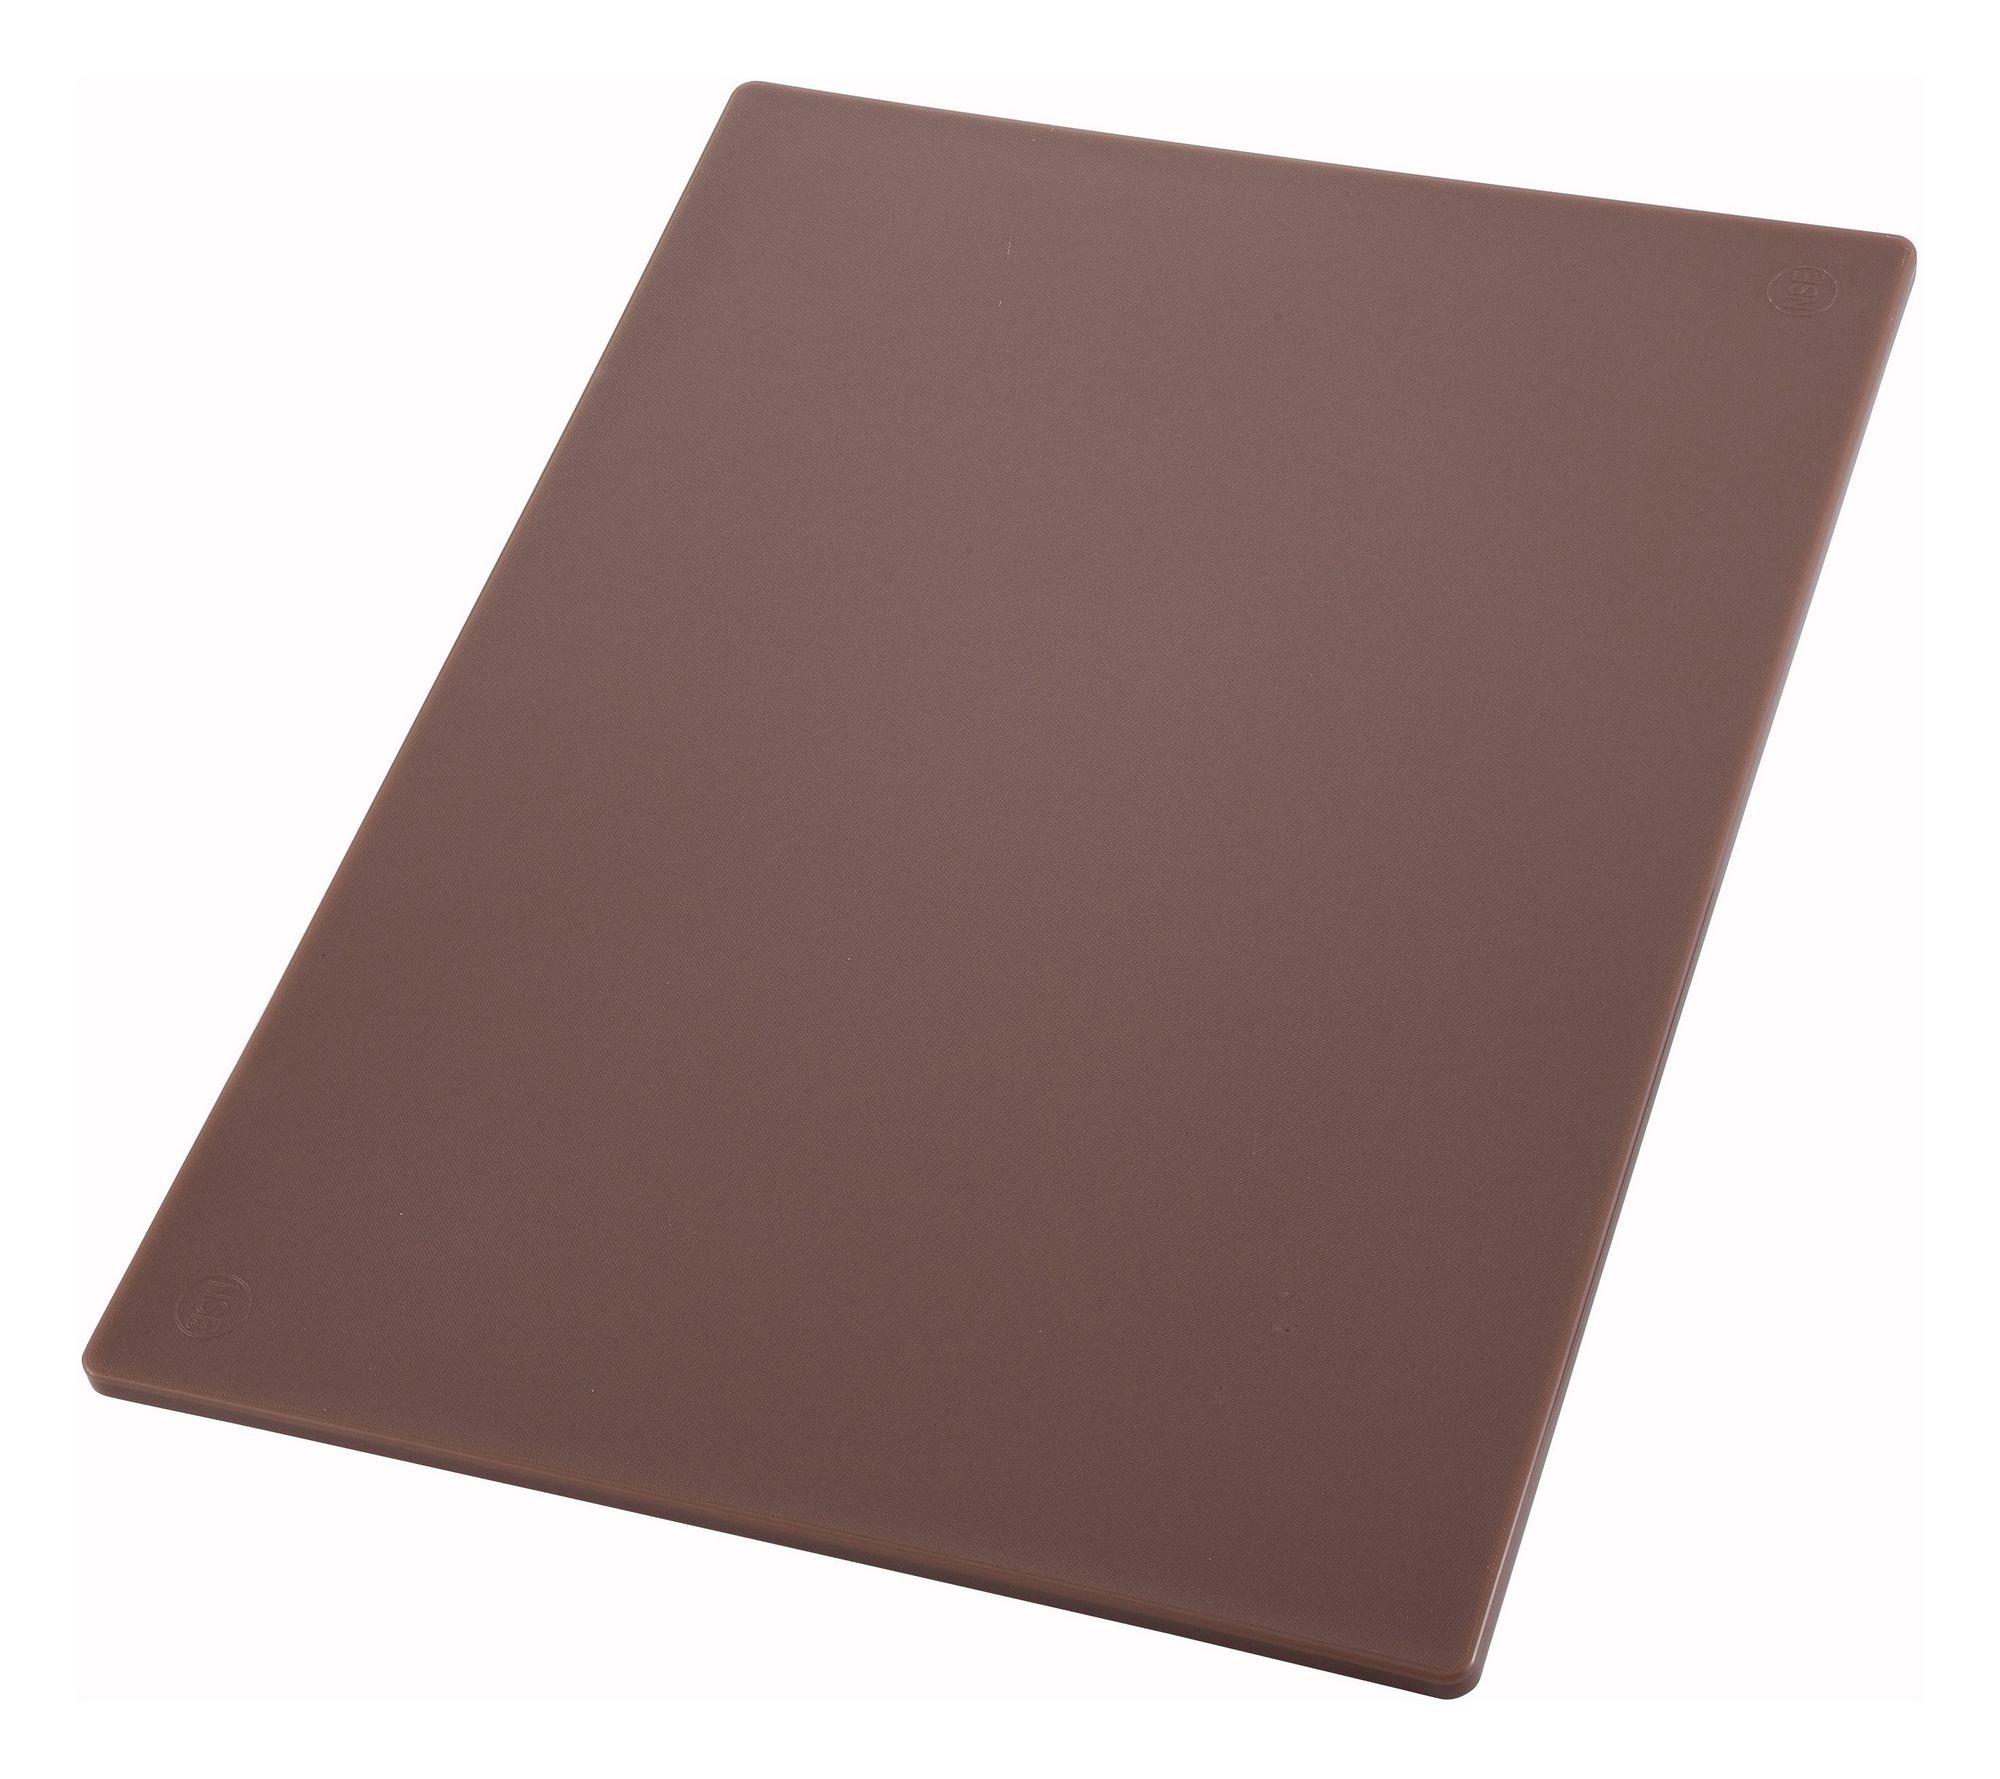 "Winco CBBN-1218 Brown Plastic Cutting Board 12""x 18"" x 1/2"""